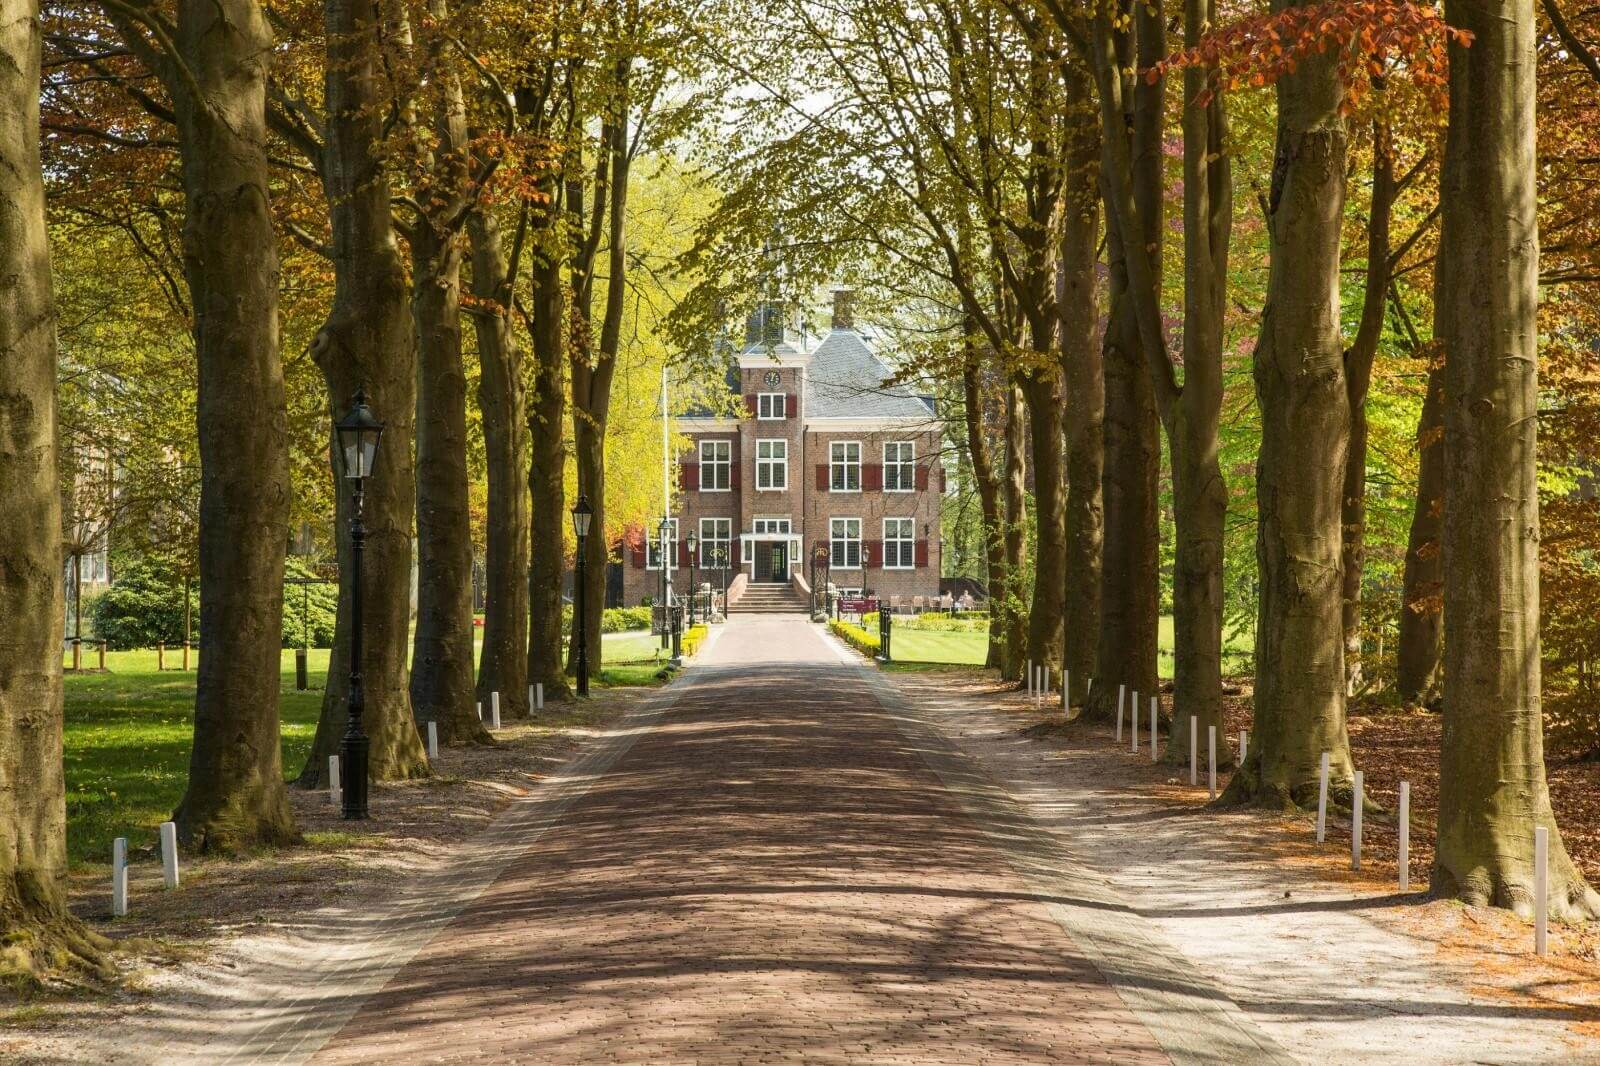 2 dagen incl. ontbijt en 3-gangen diner in kasteelhotel op de Veluwe